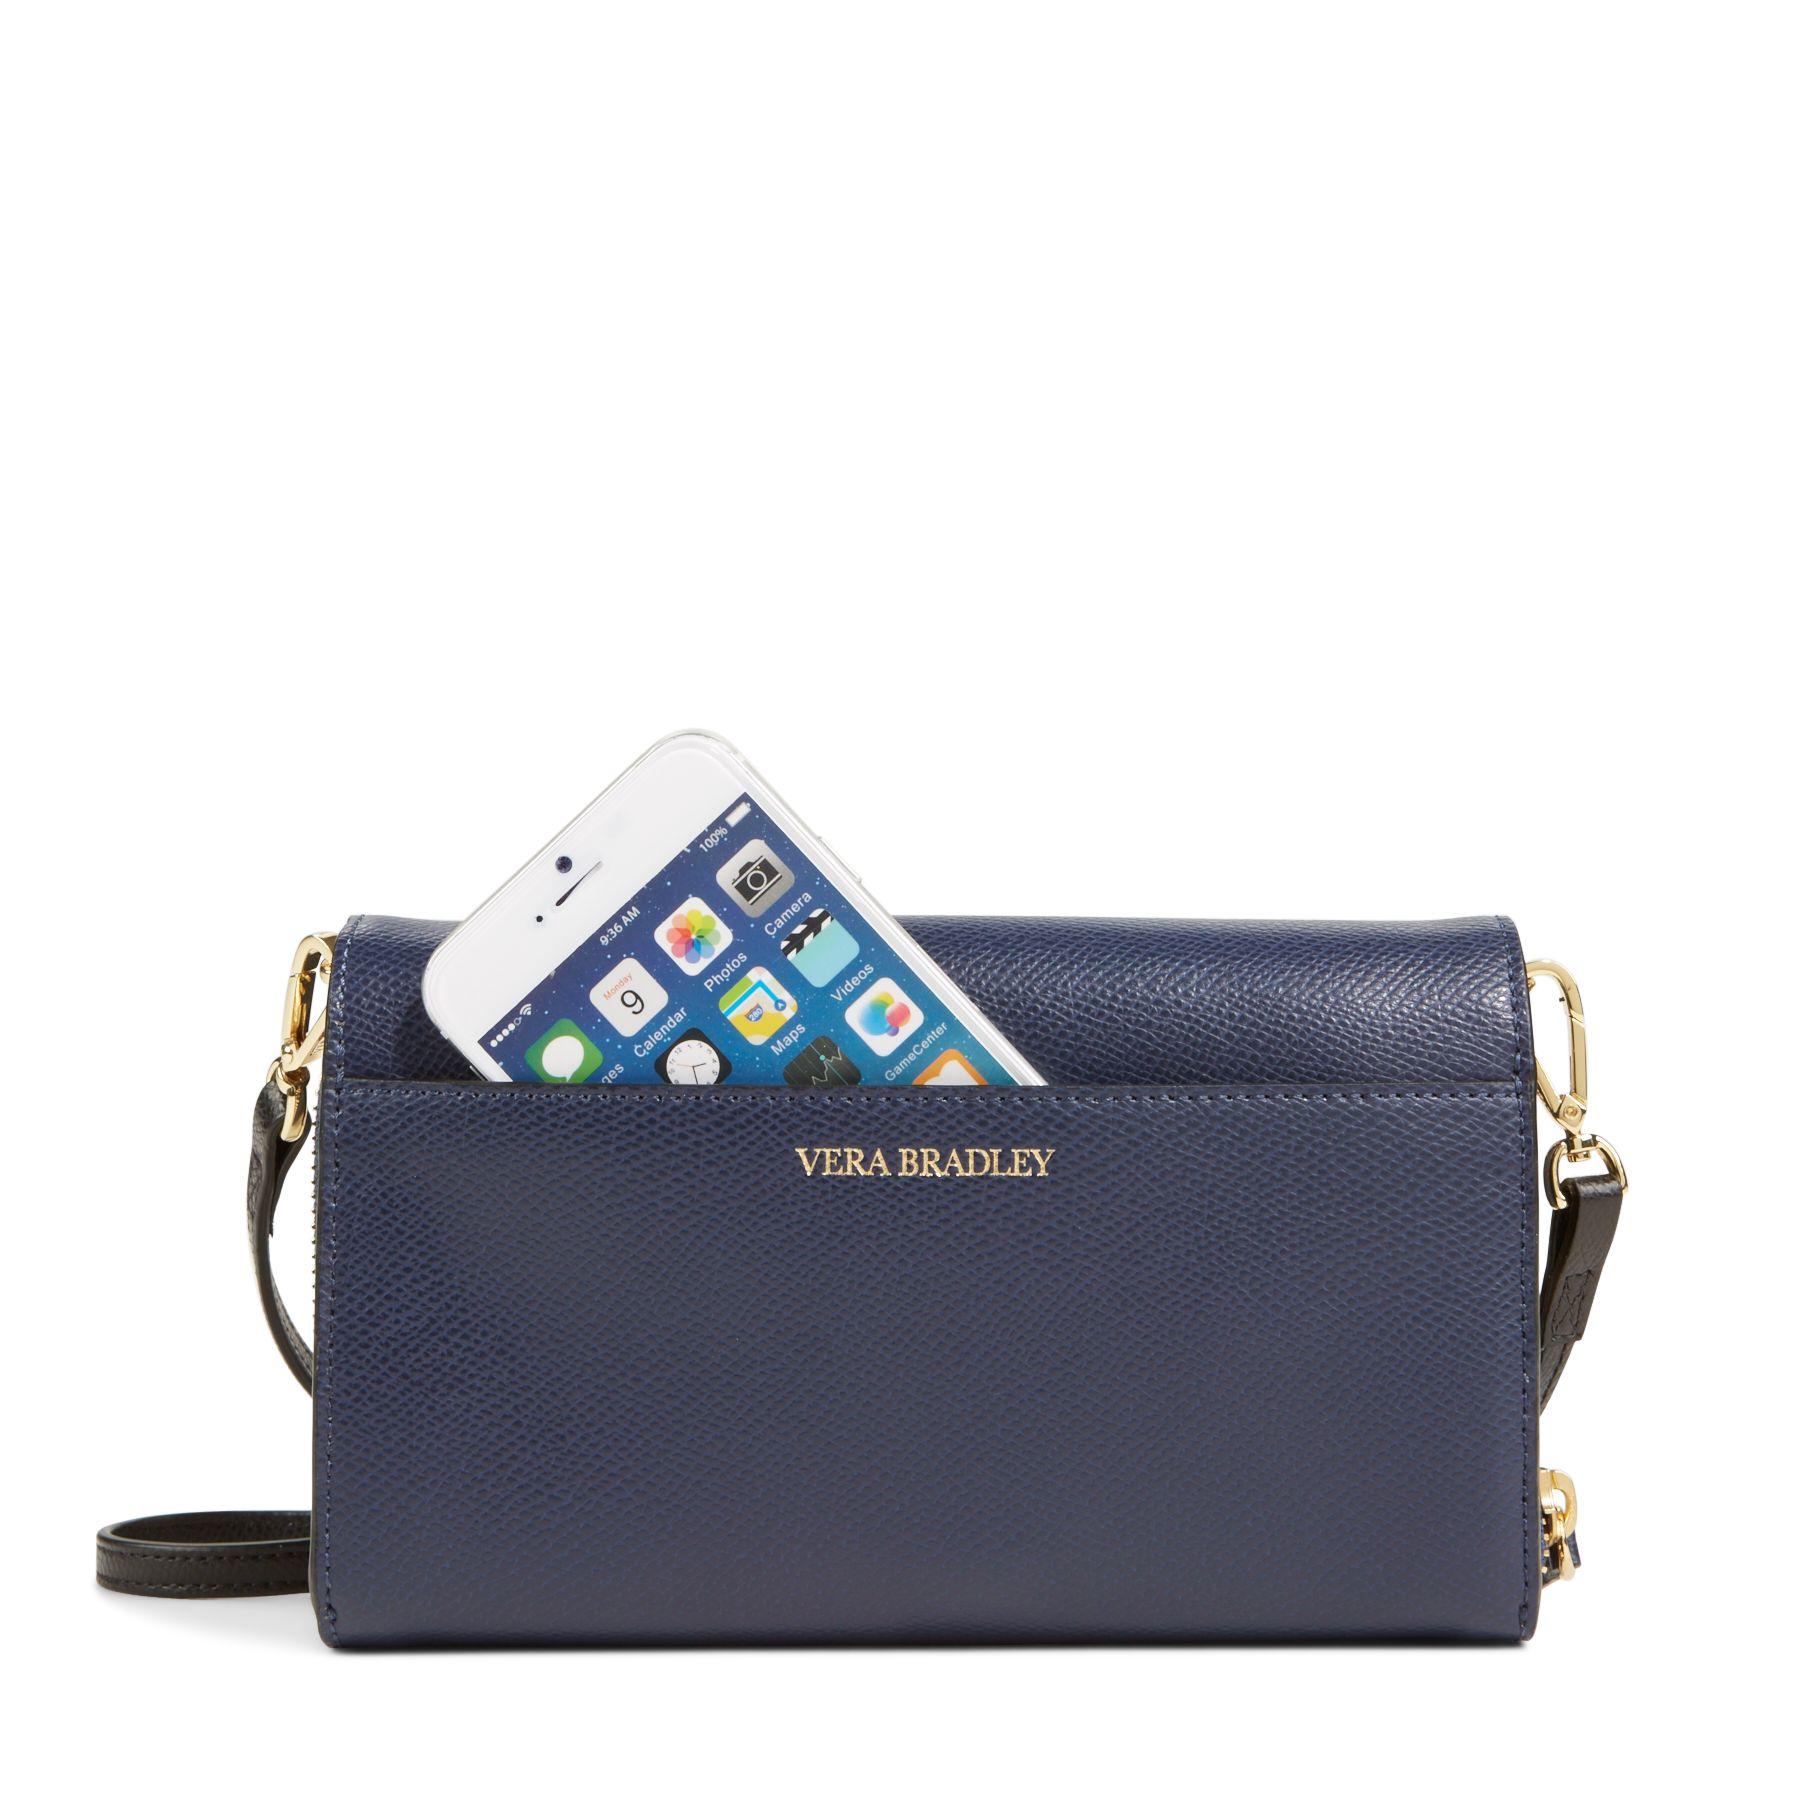 Vera Bradley Leather Ultimate Crossbody Bag Ebay